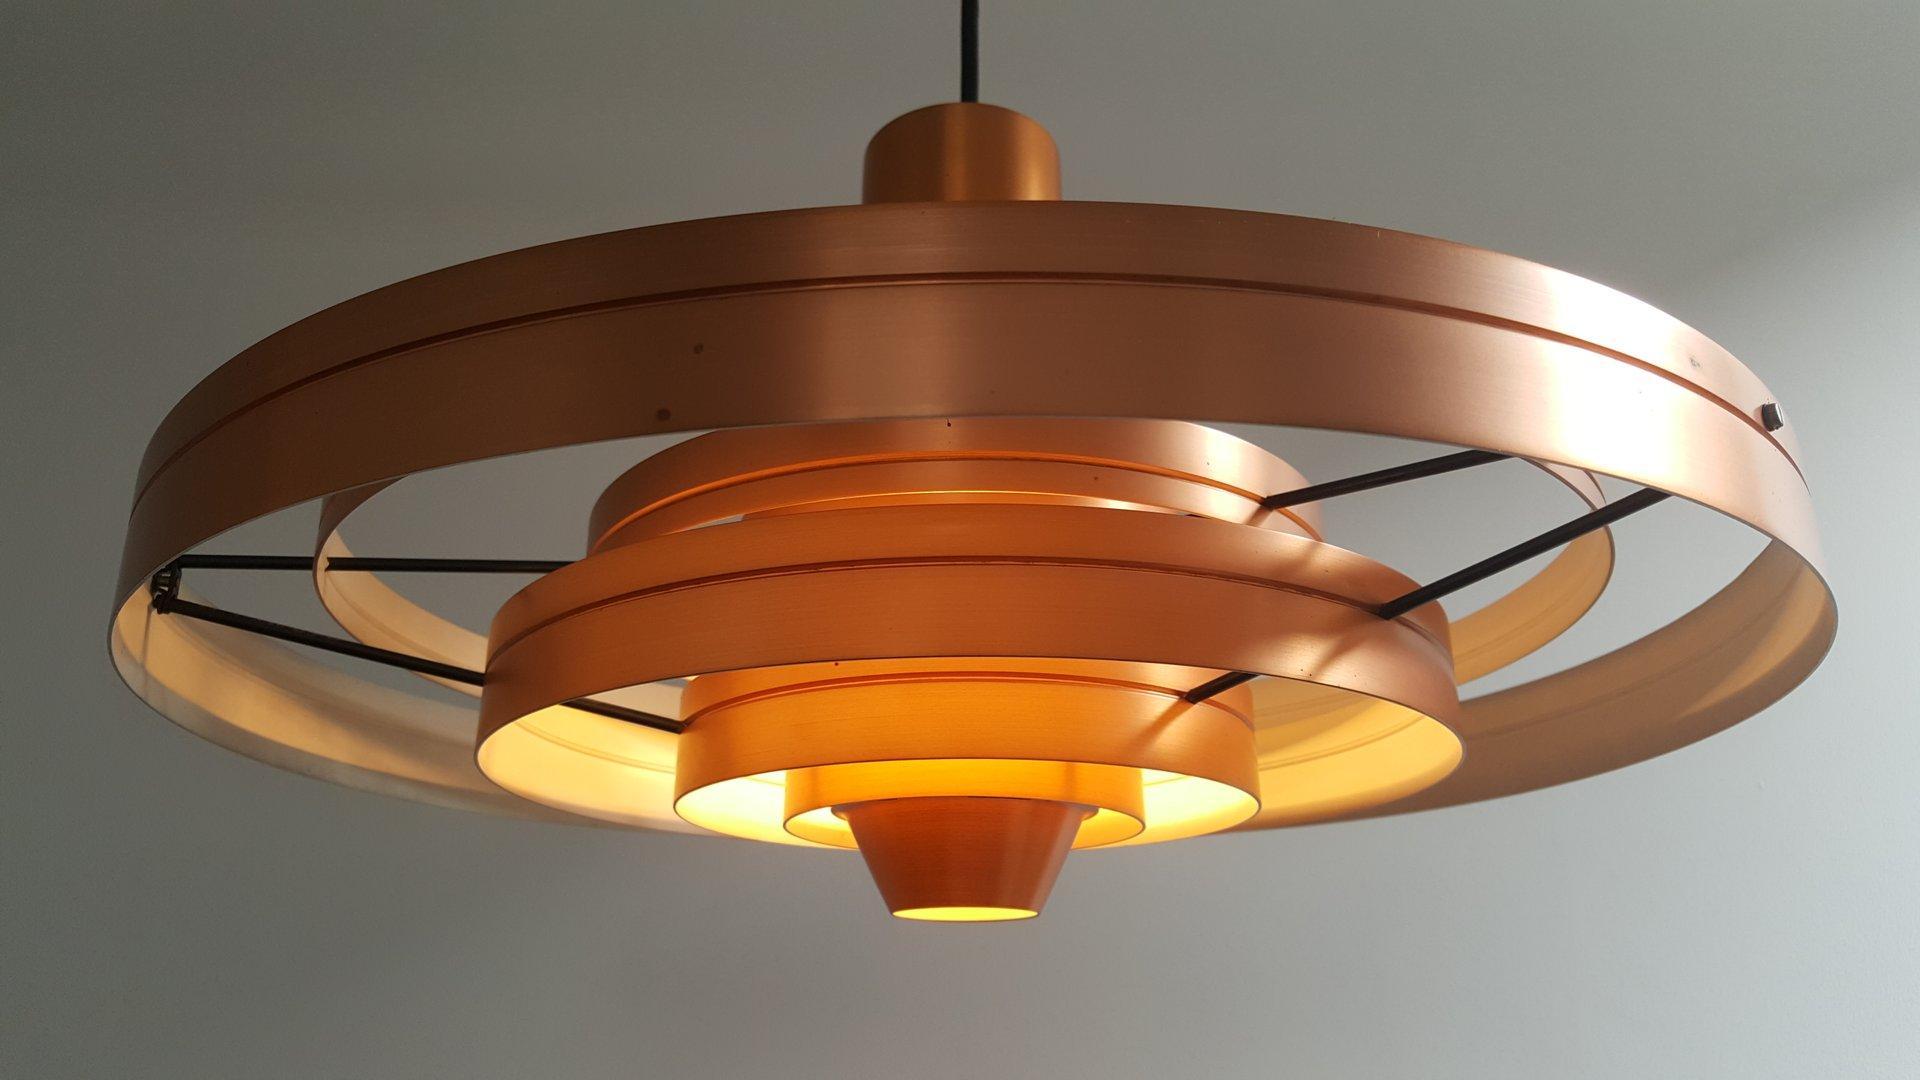 copper fibonacci pendant light by sophus frandsen for fog. Black Bedroom Furniture Sets. Home Design Ideas